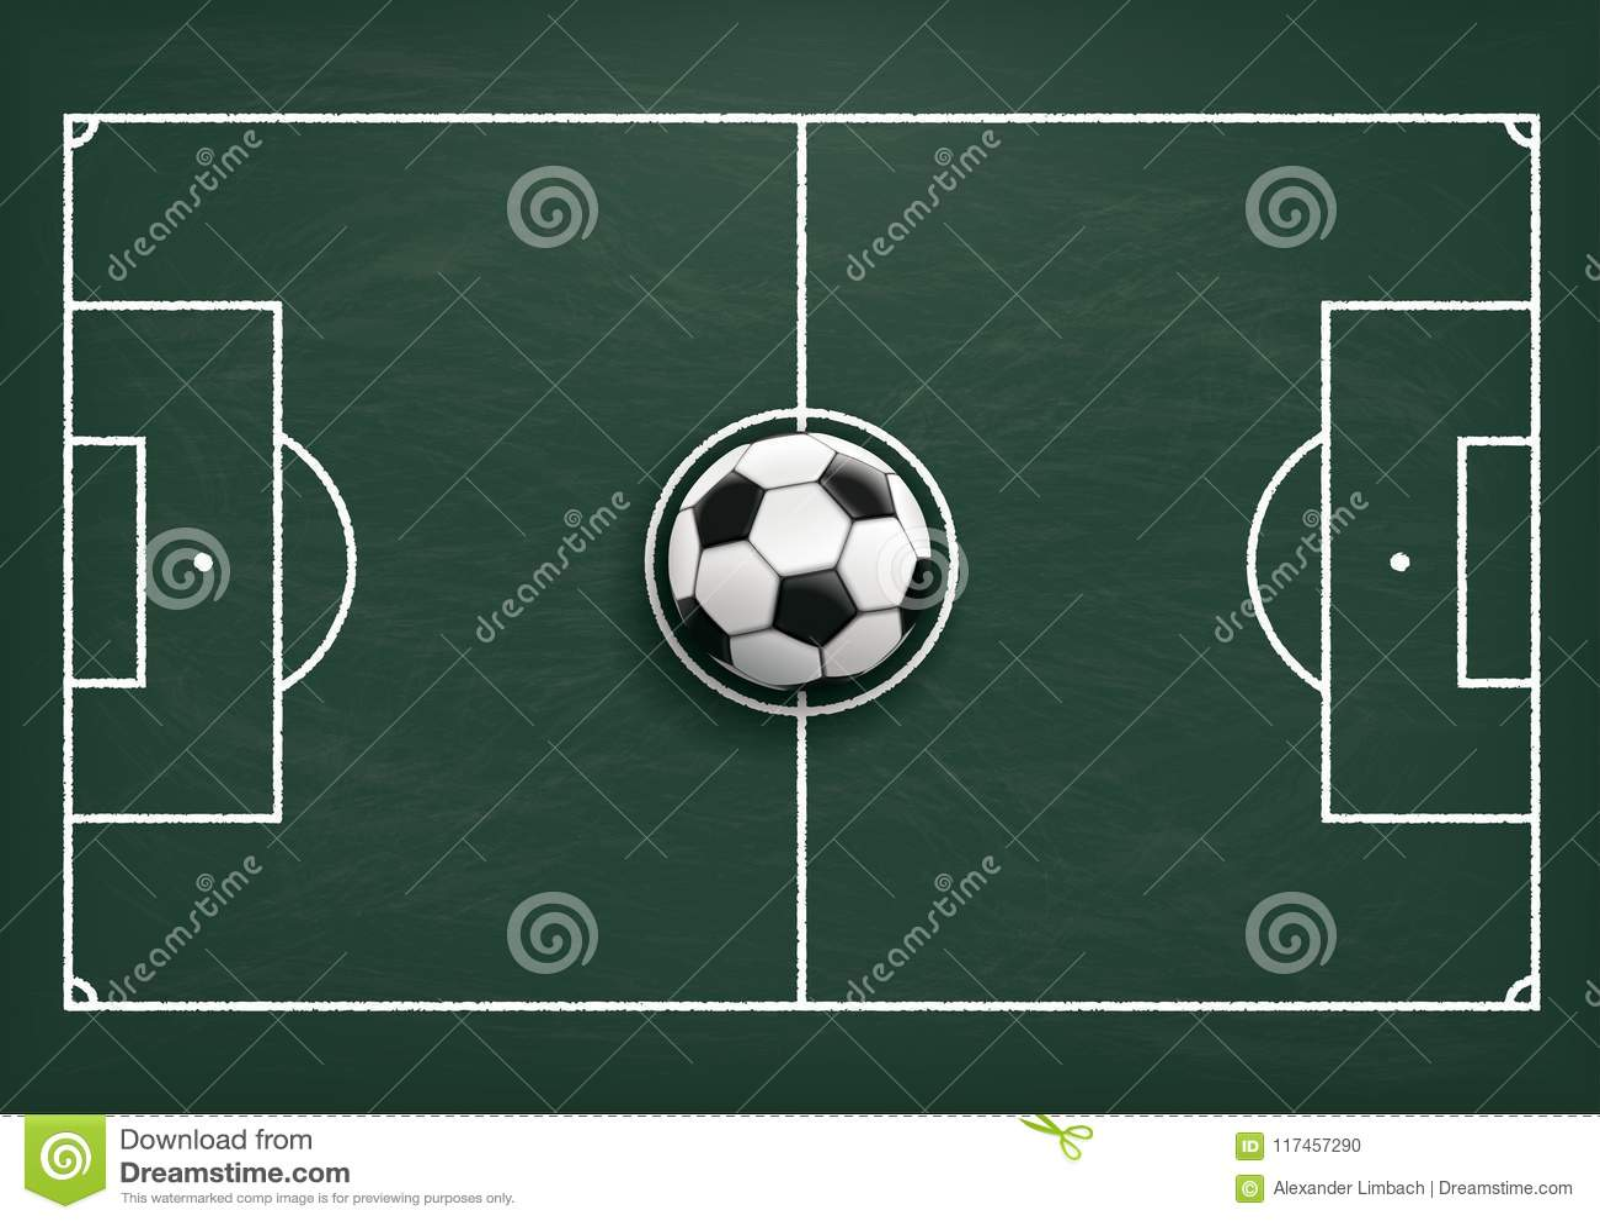 Football Tactics Ground Green Blackboard Stock Vector Illustration